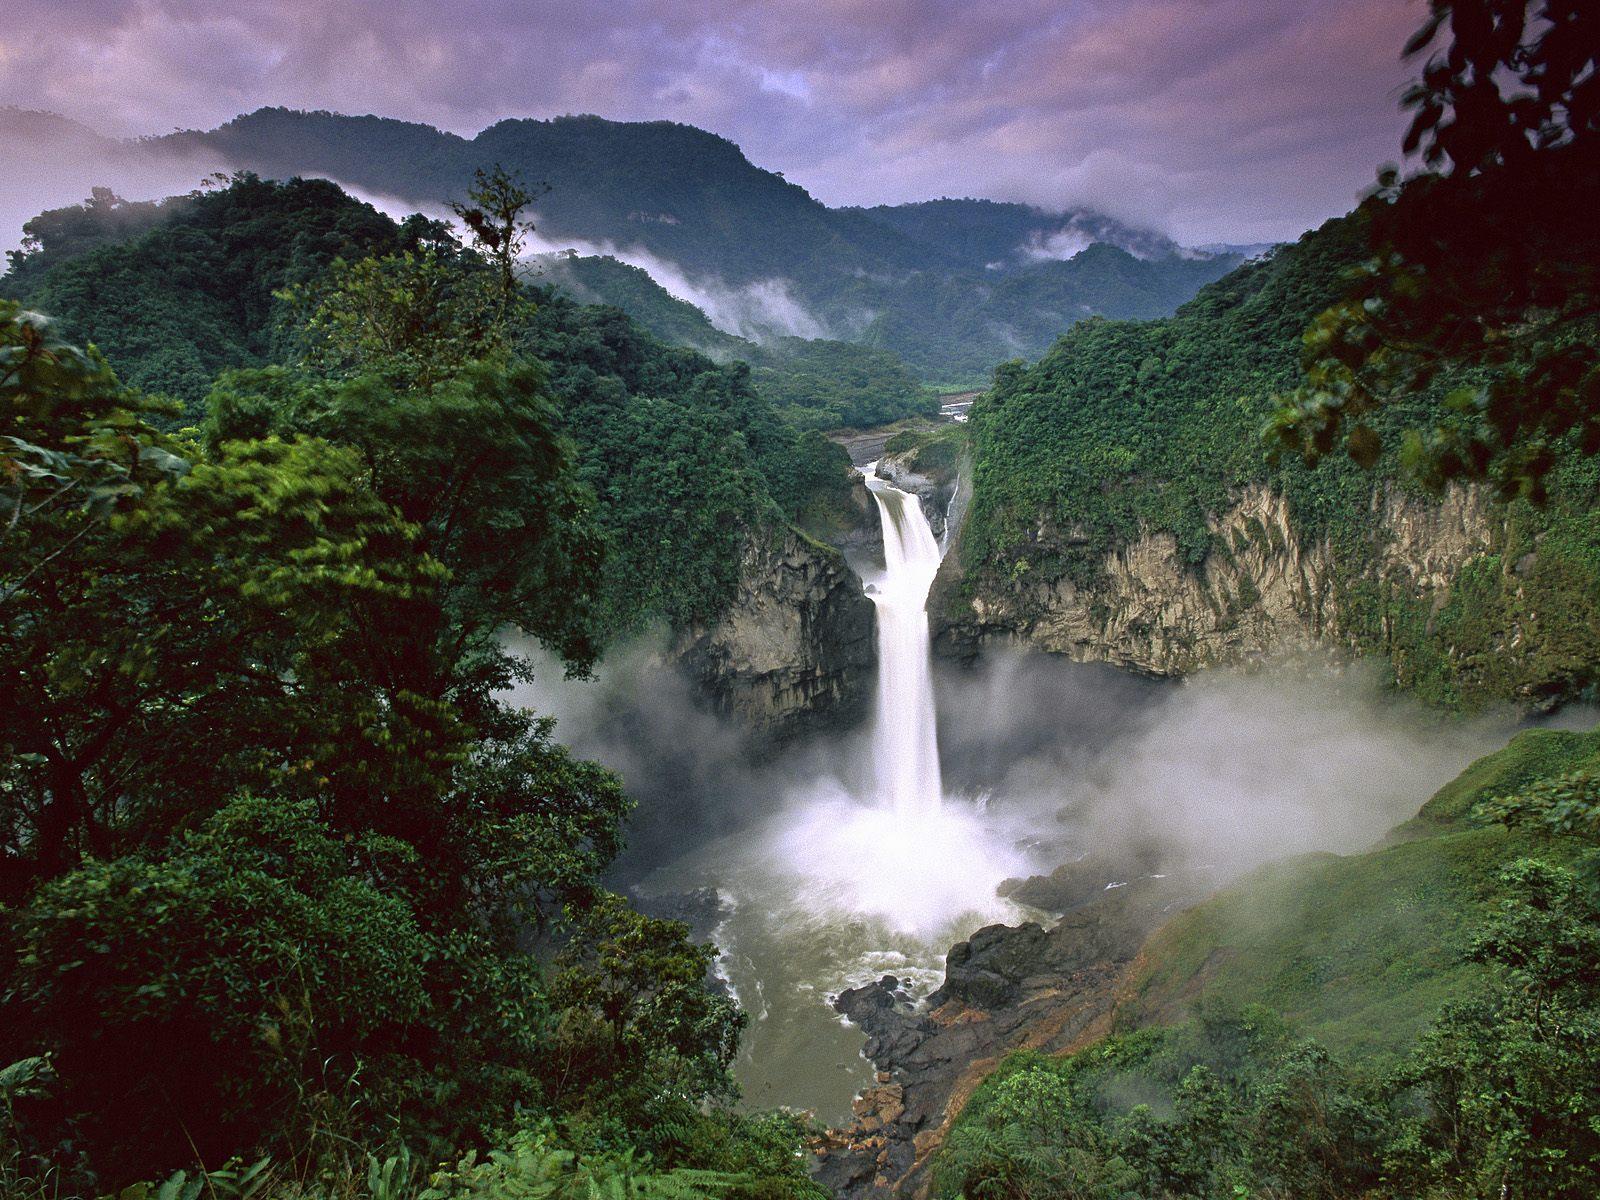 The Amazon Jungle: Tearing Down Amazon Rainforest's Landscapes